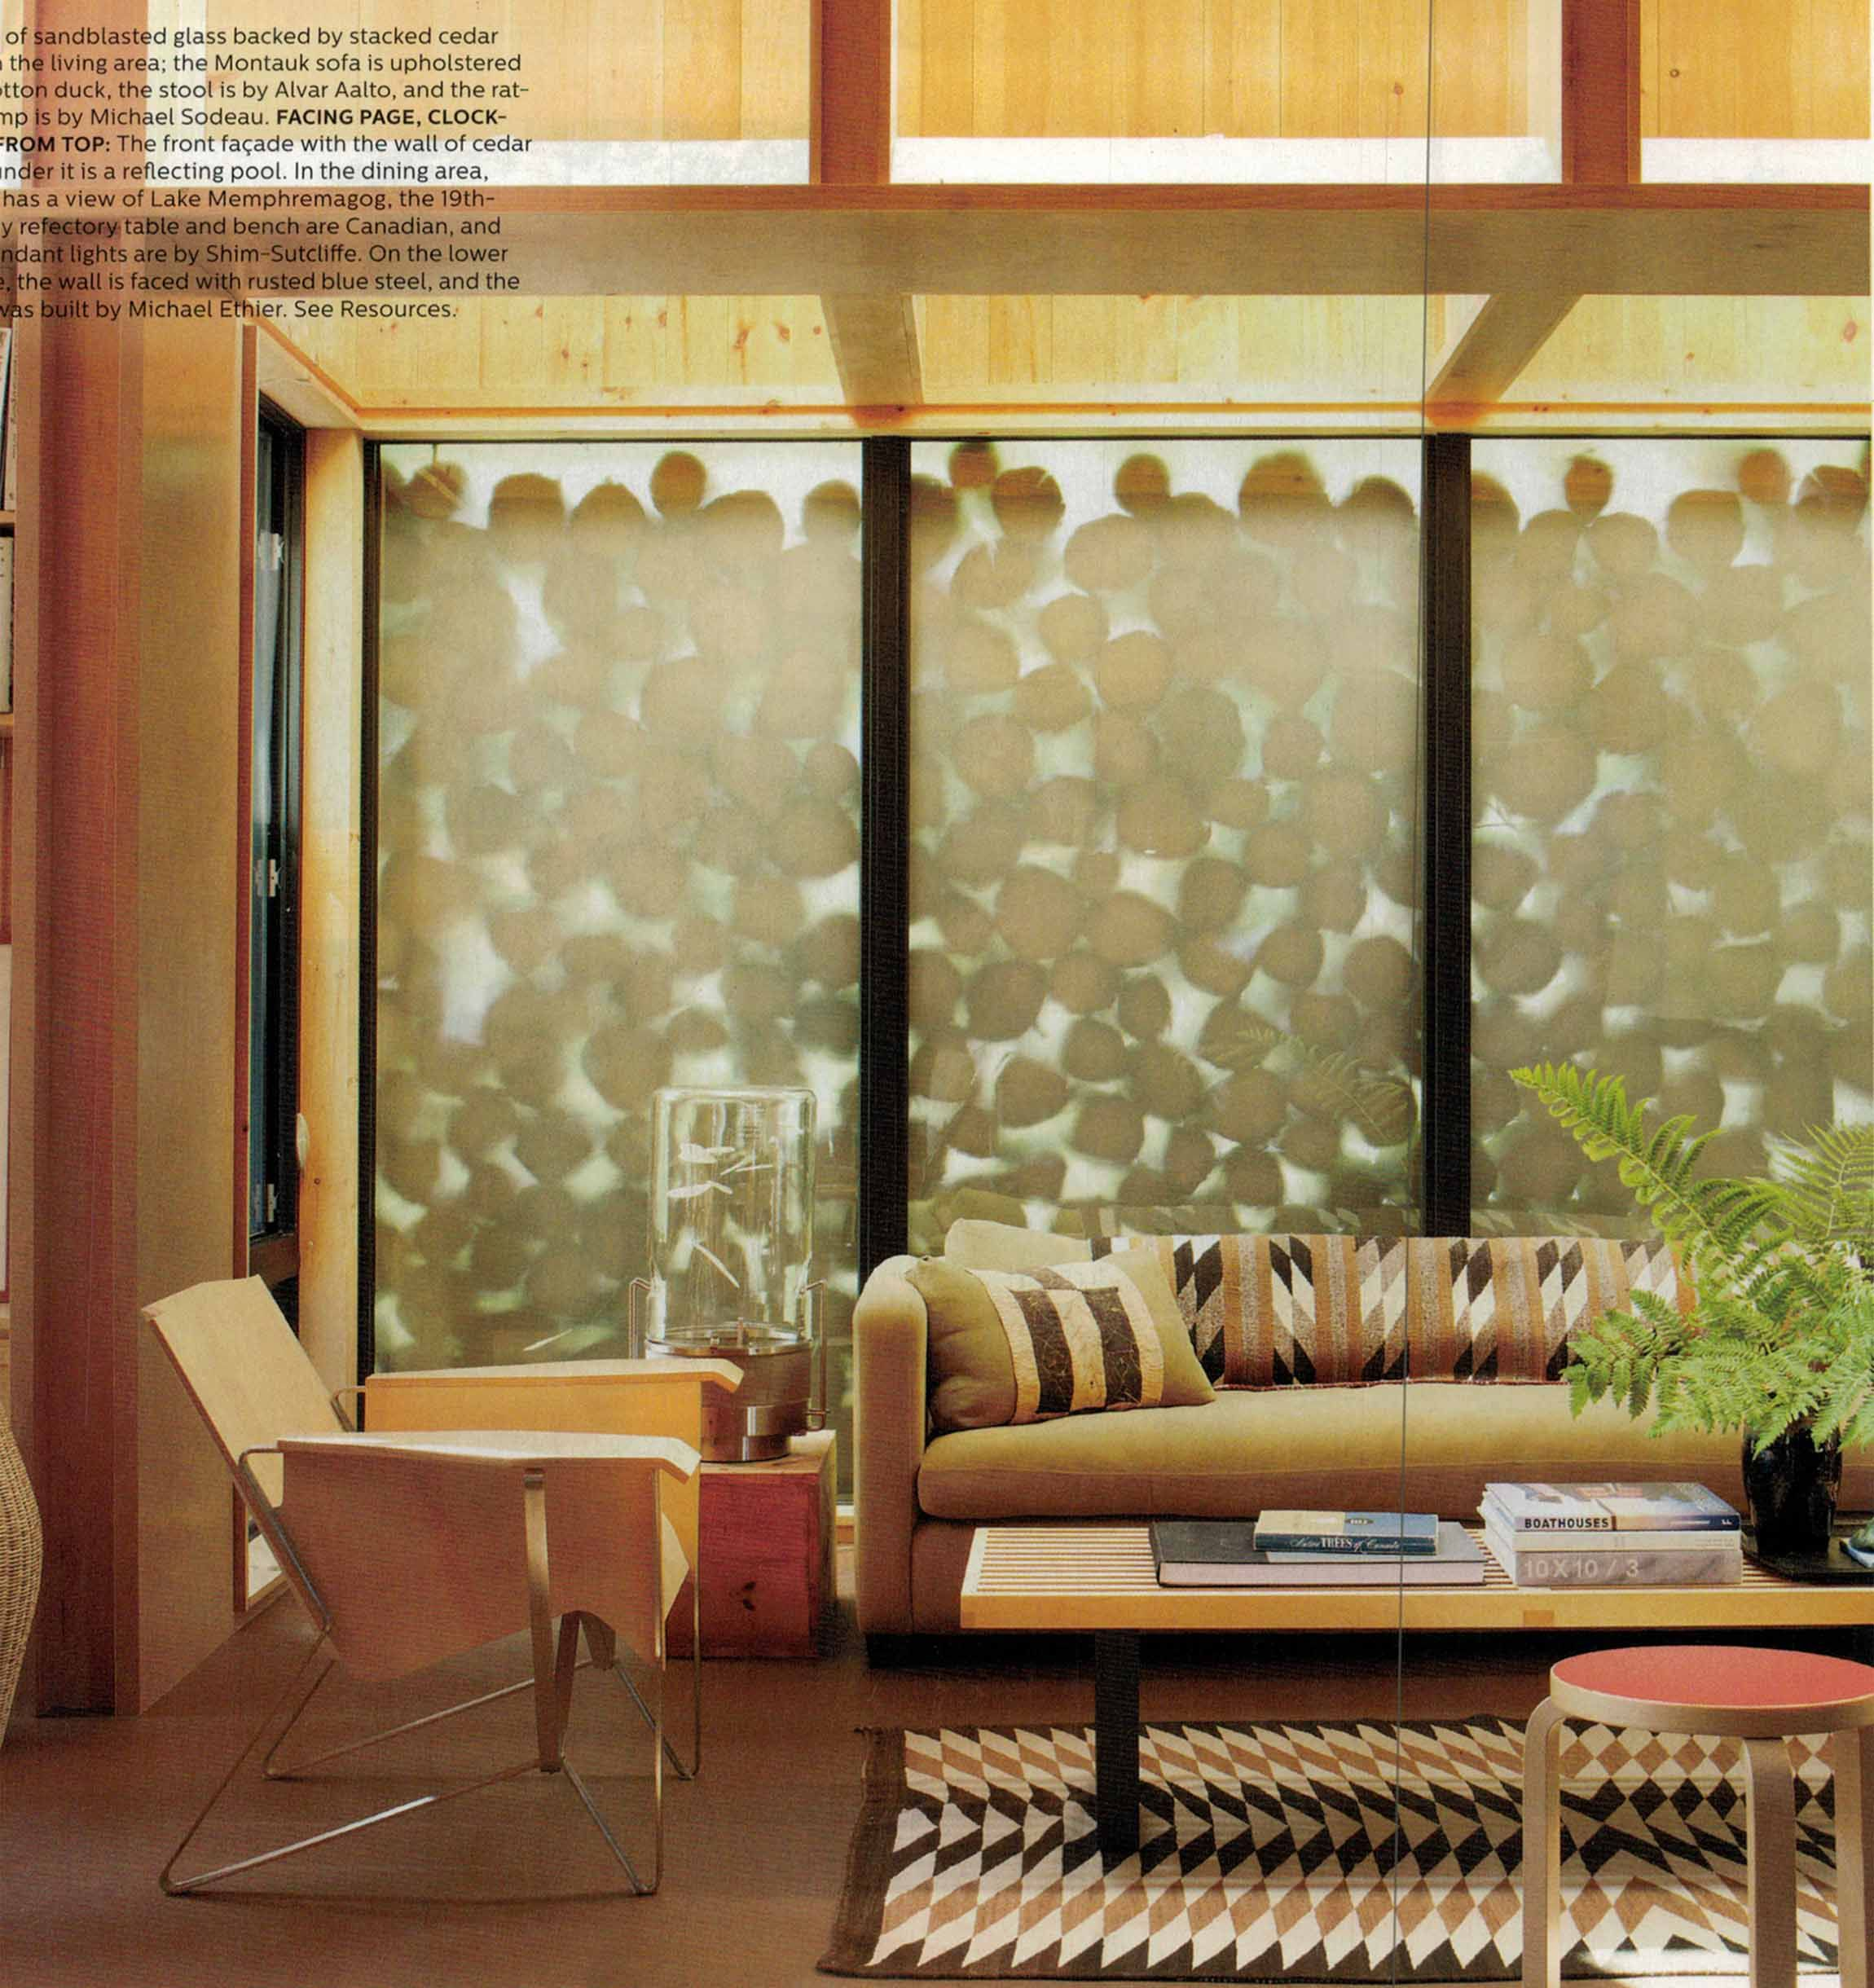 Pin de Jillian OConnor en Living Space